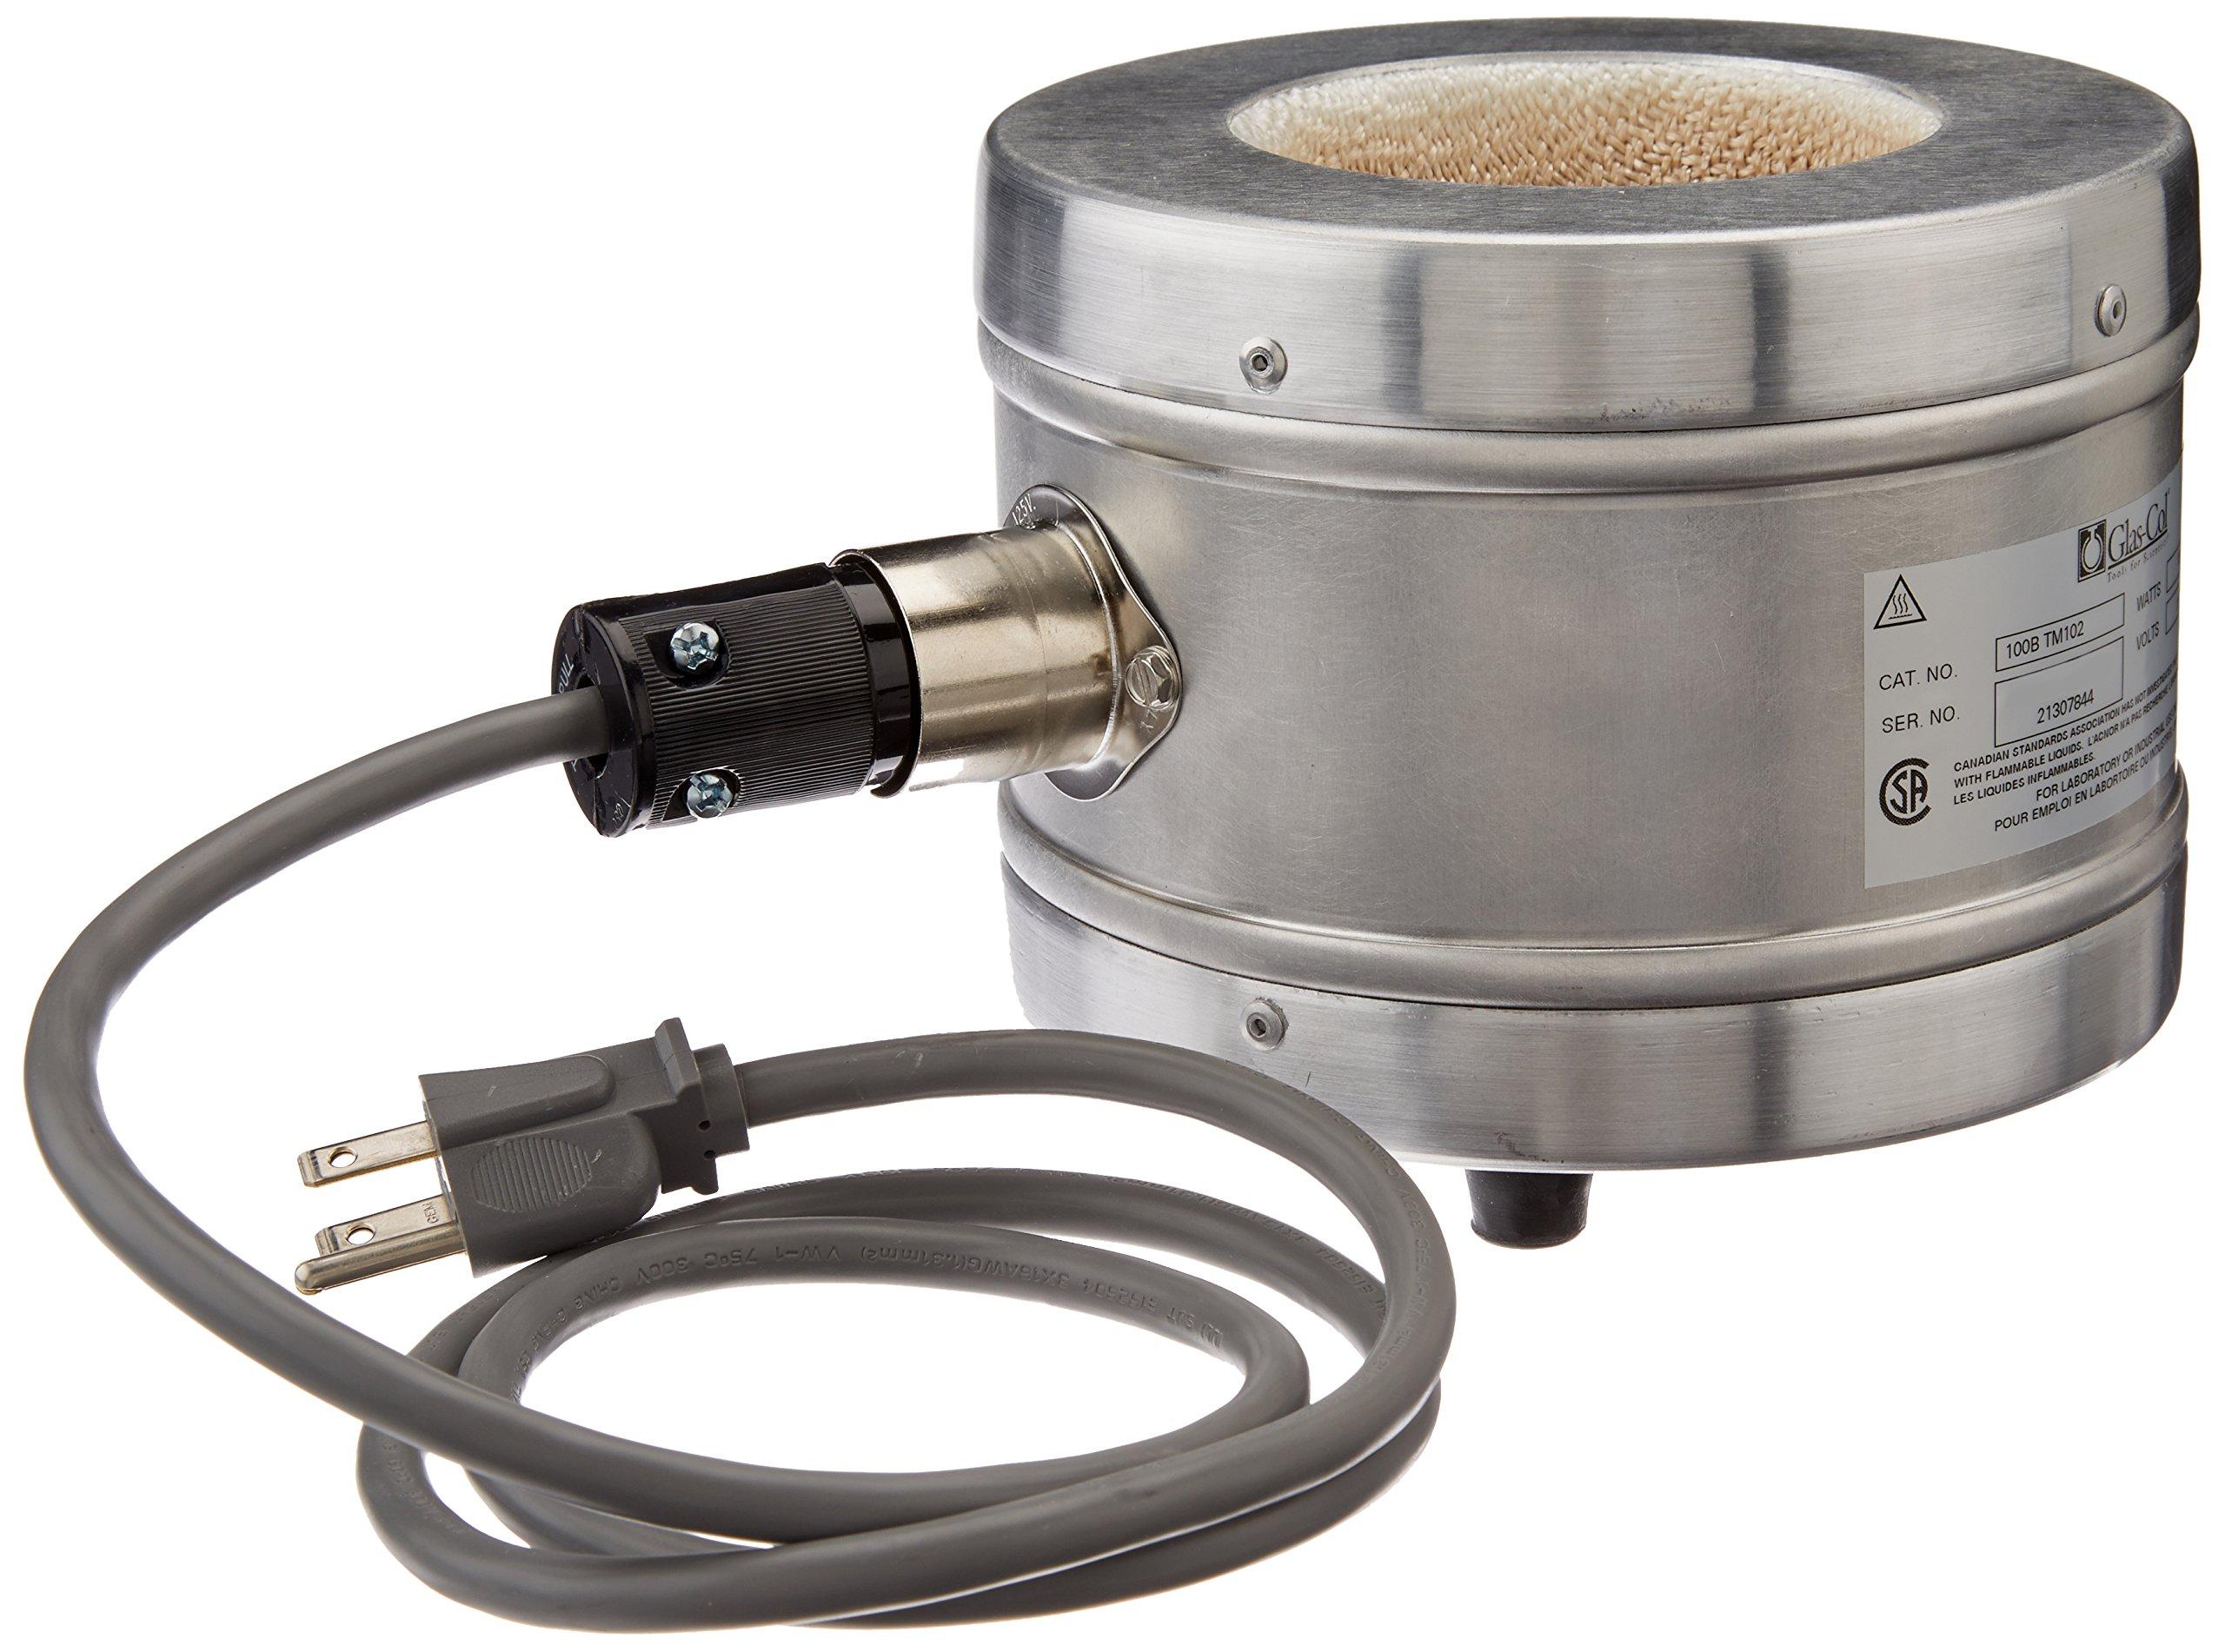 Glas-Col 100B TM102 Series TM Aluminum Housed Mantle for Spherical Flask, 250ml Flask Capacity, 115V